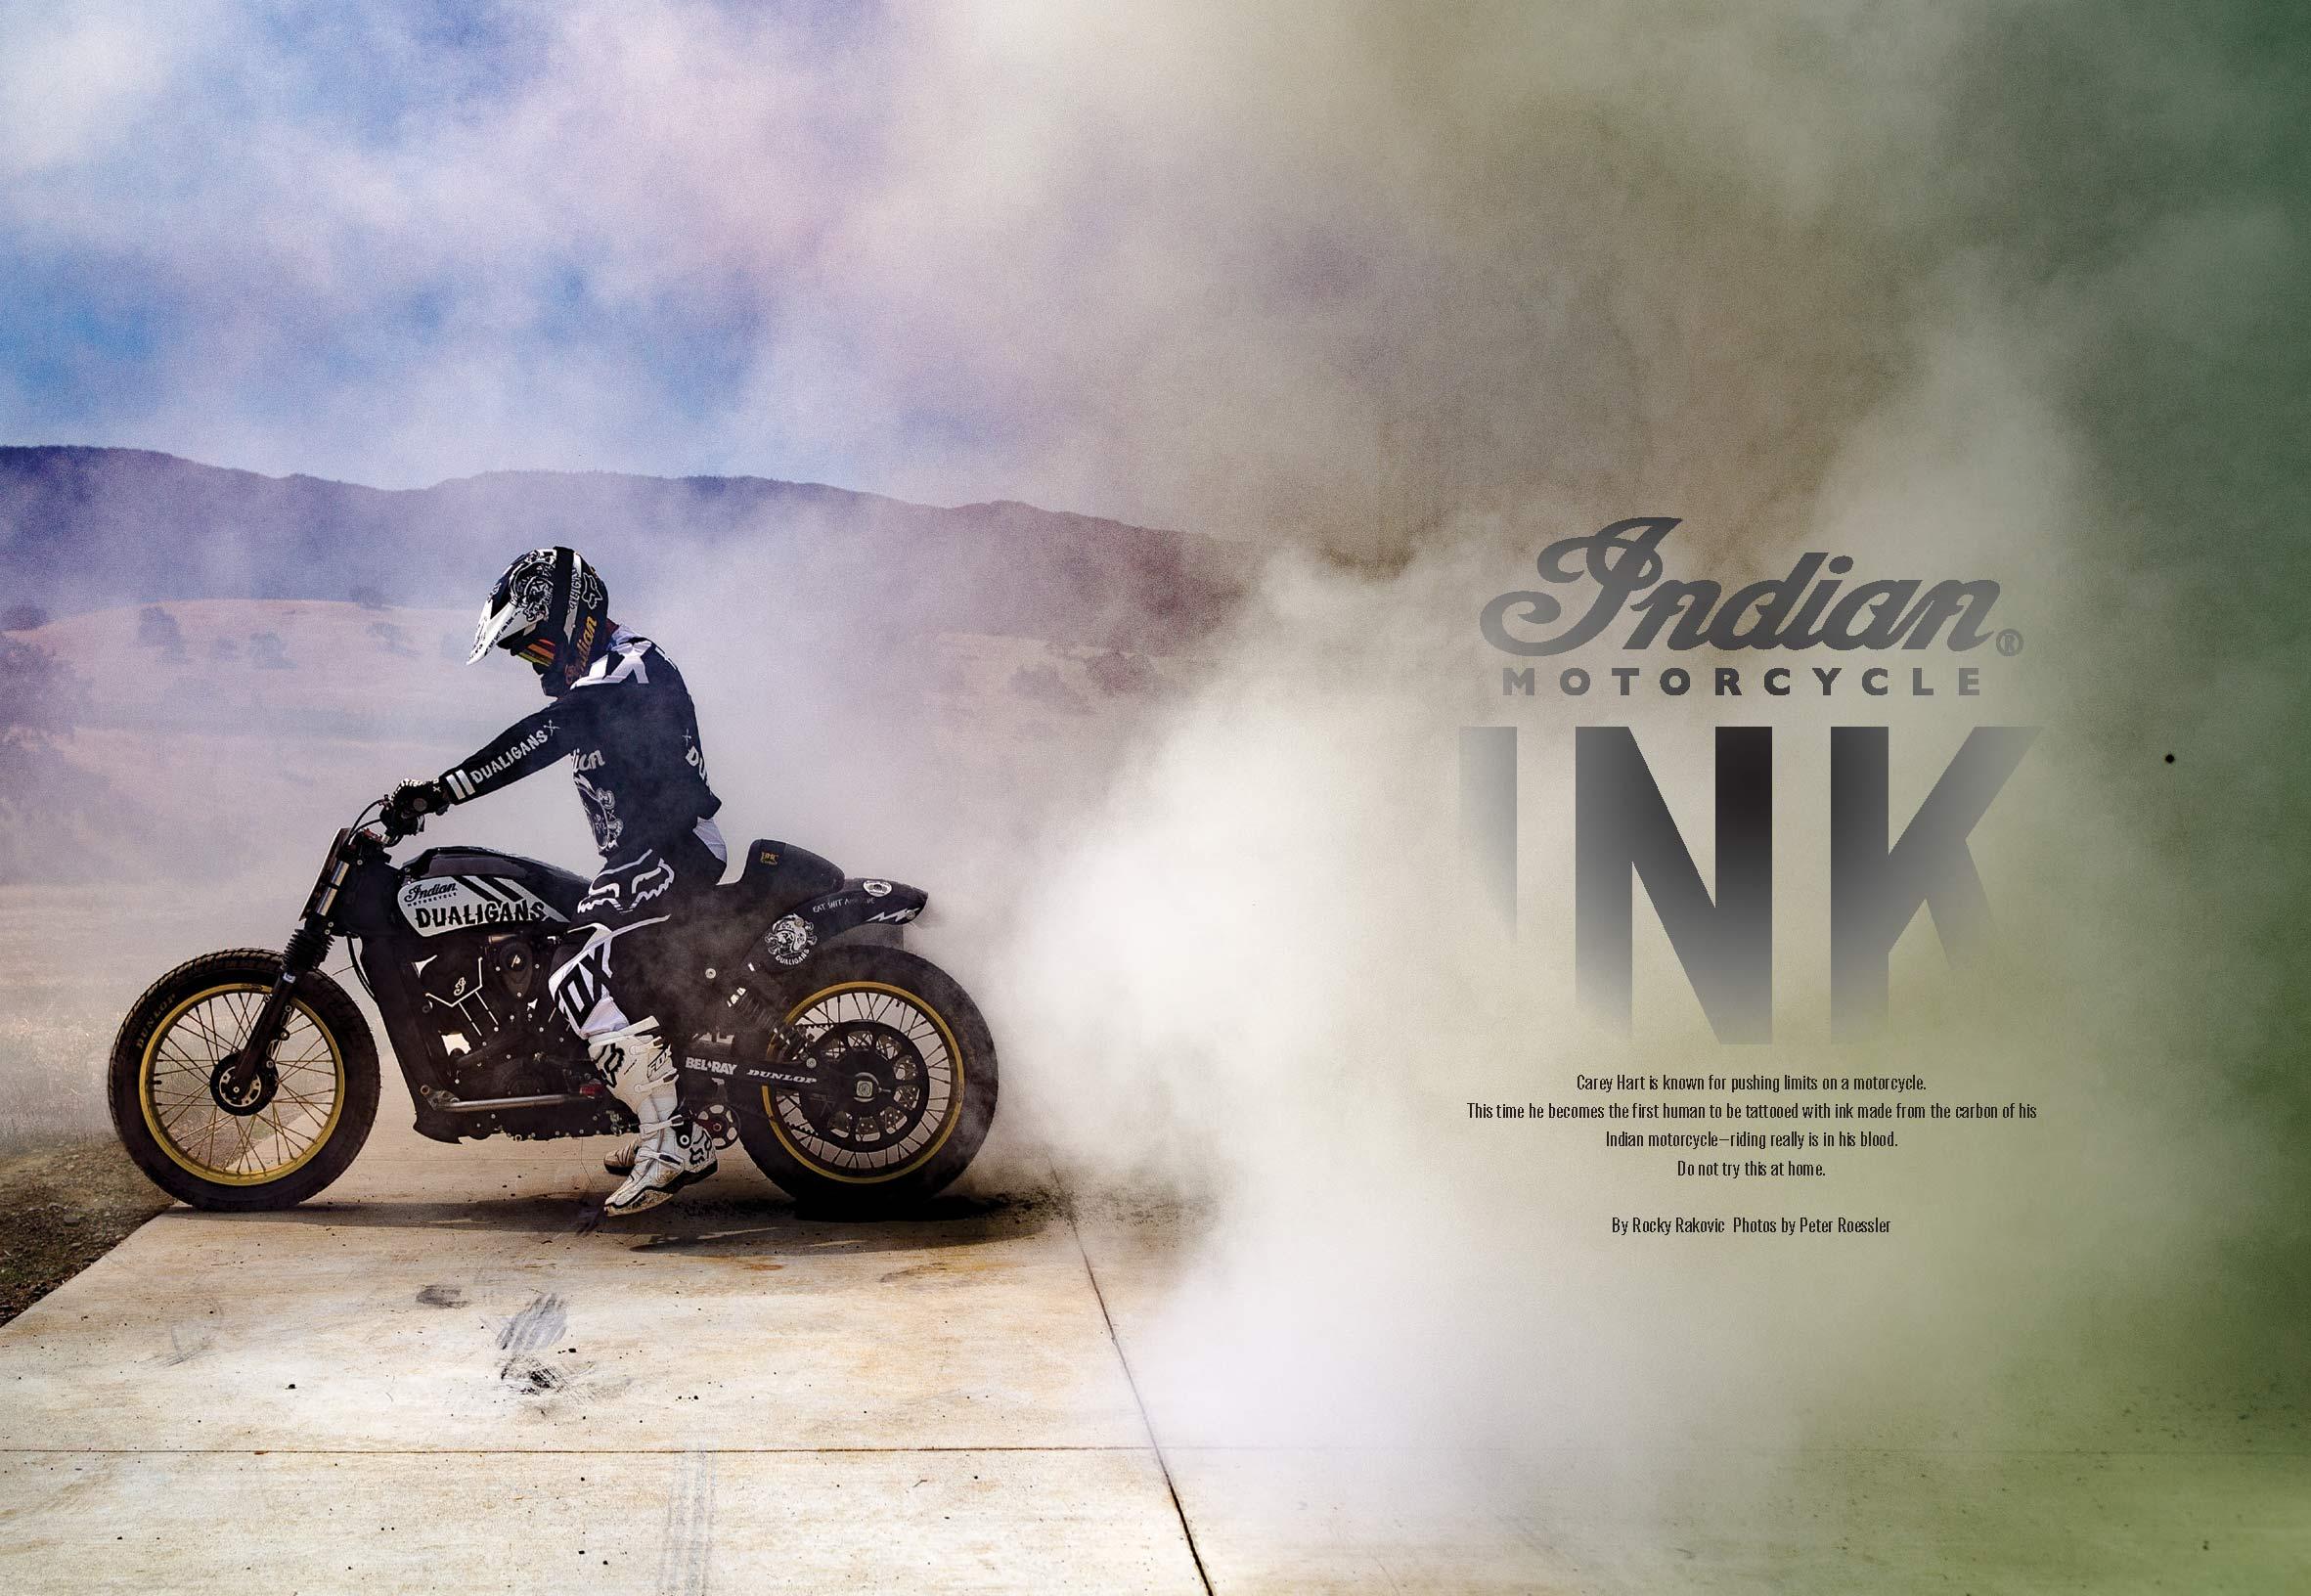 CAREY HART - INDIAN MOTORCYCLE